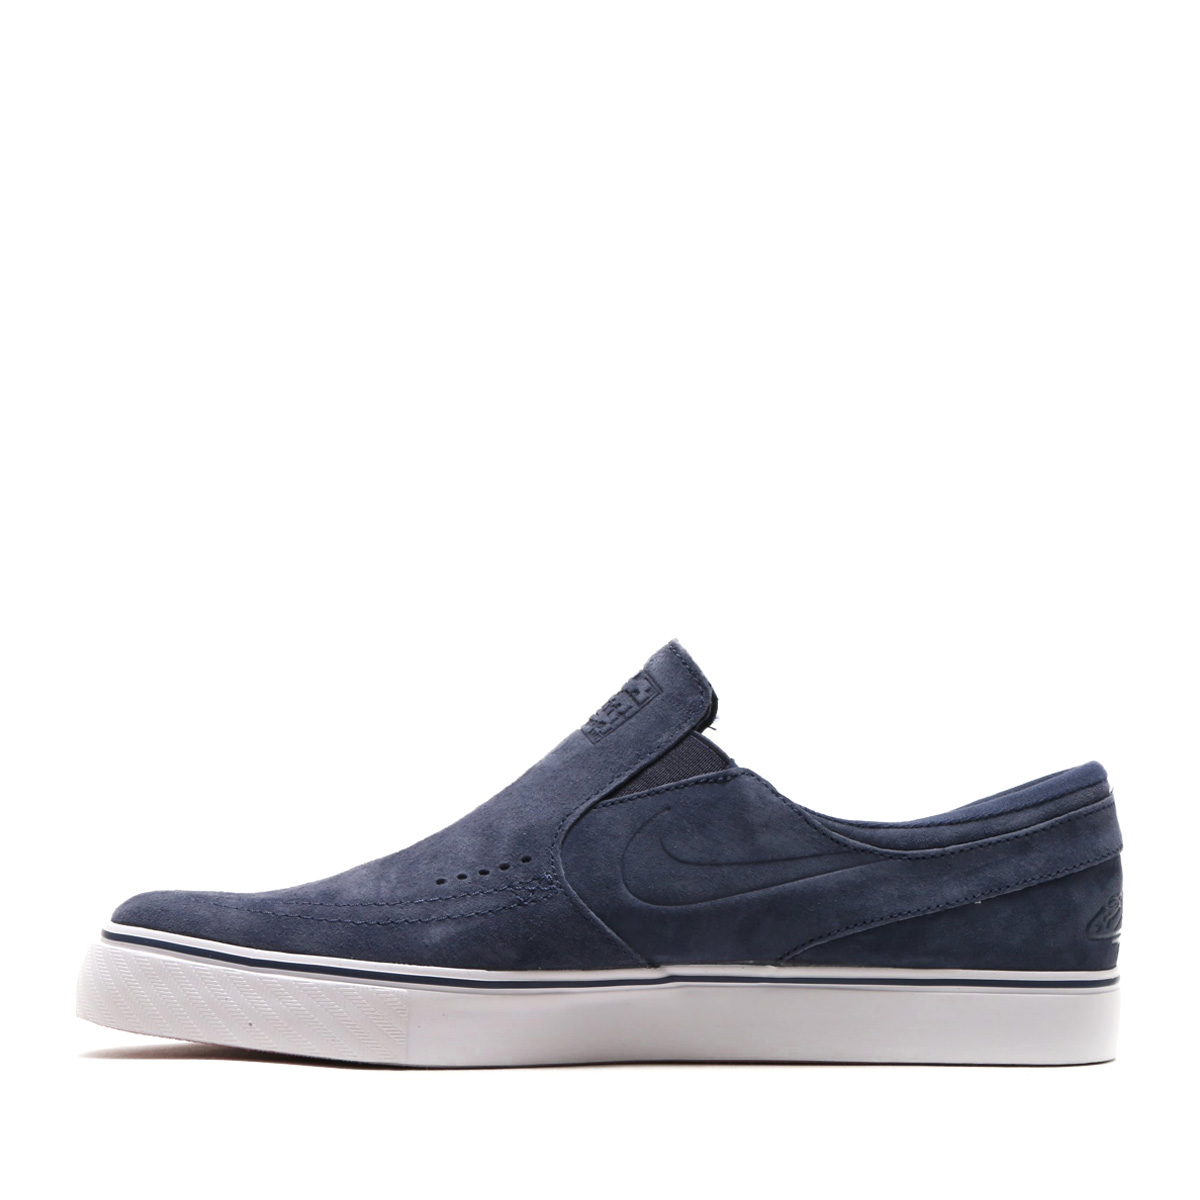 reputable site 9ff5c 159f1 NIKE SB ZOOM JANOSKI SLIP QS (Nike SB ズームジャノスキースリッポン QS) (THUNDER BLUE THUNDER  BLUE-SAIL) 18SP-S